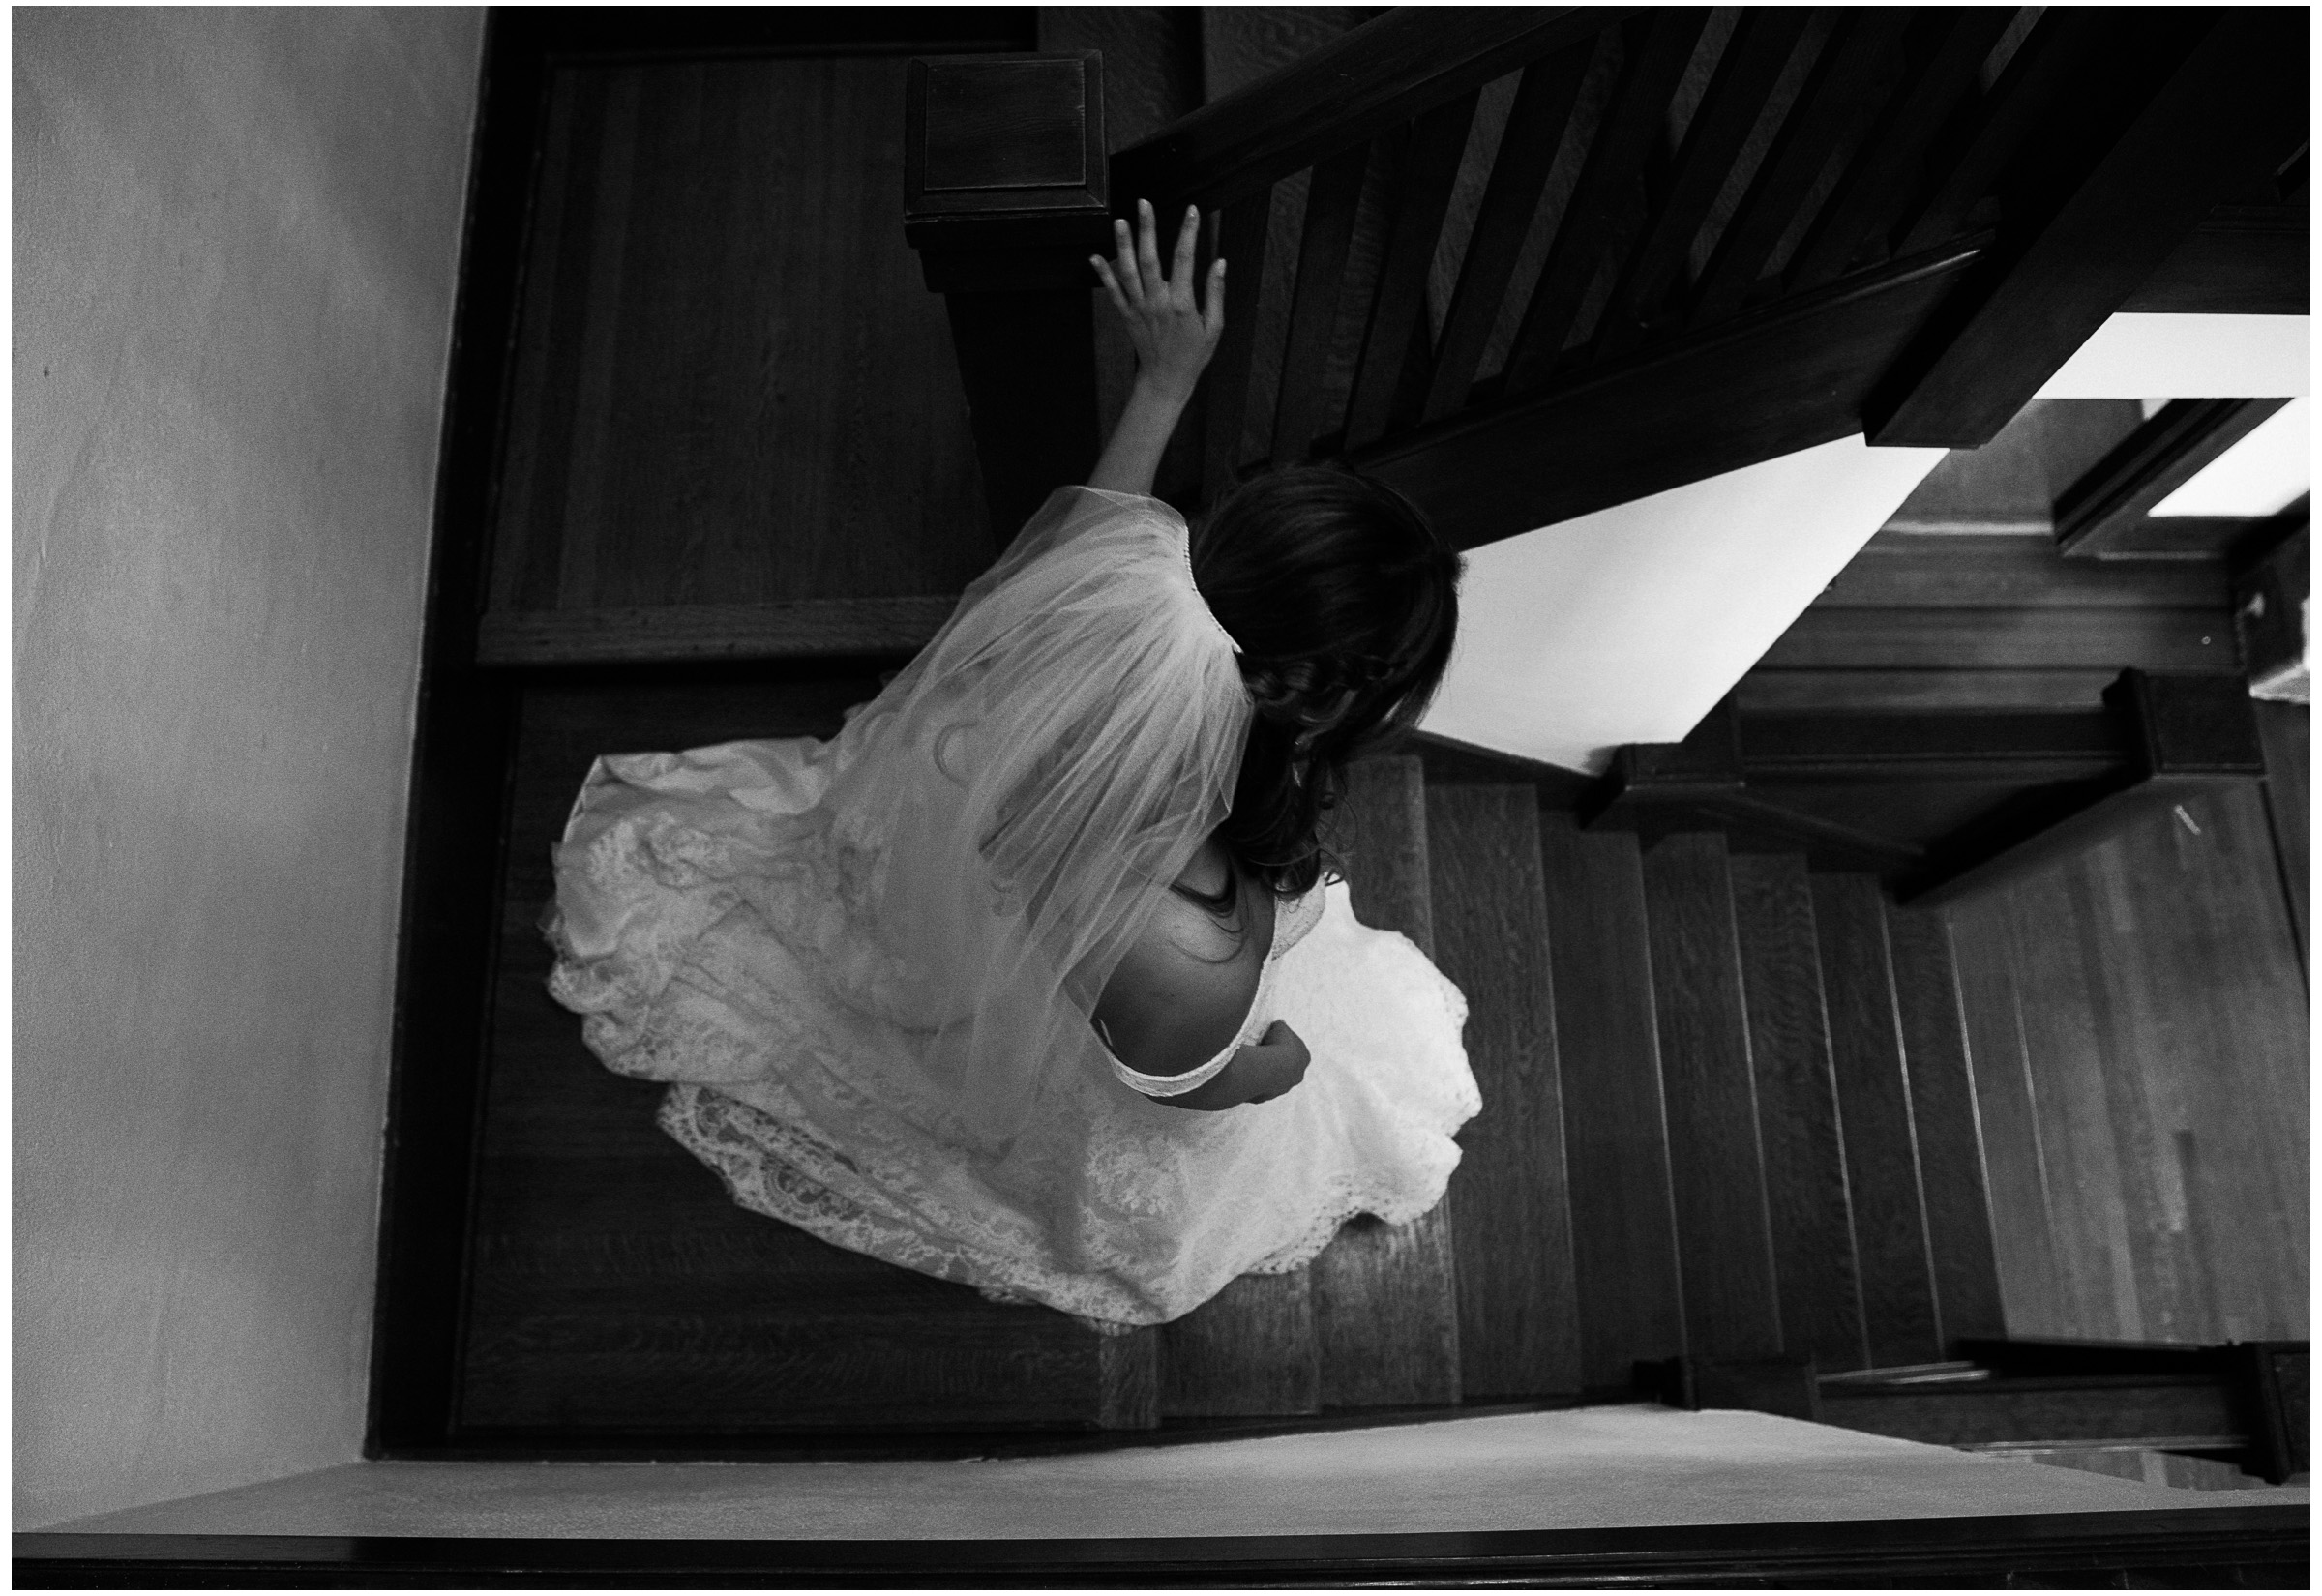 Winters Wedding - Sacramento Photographer - Field & Pond - Justin Wilcox Photography - 9.jpg